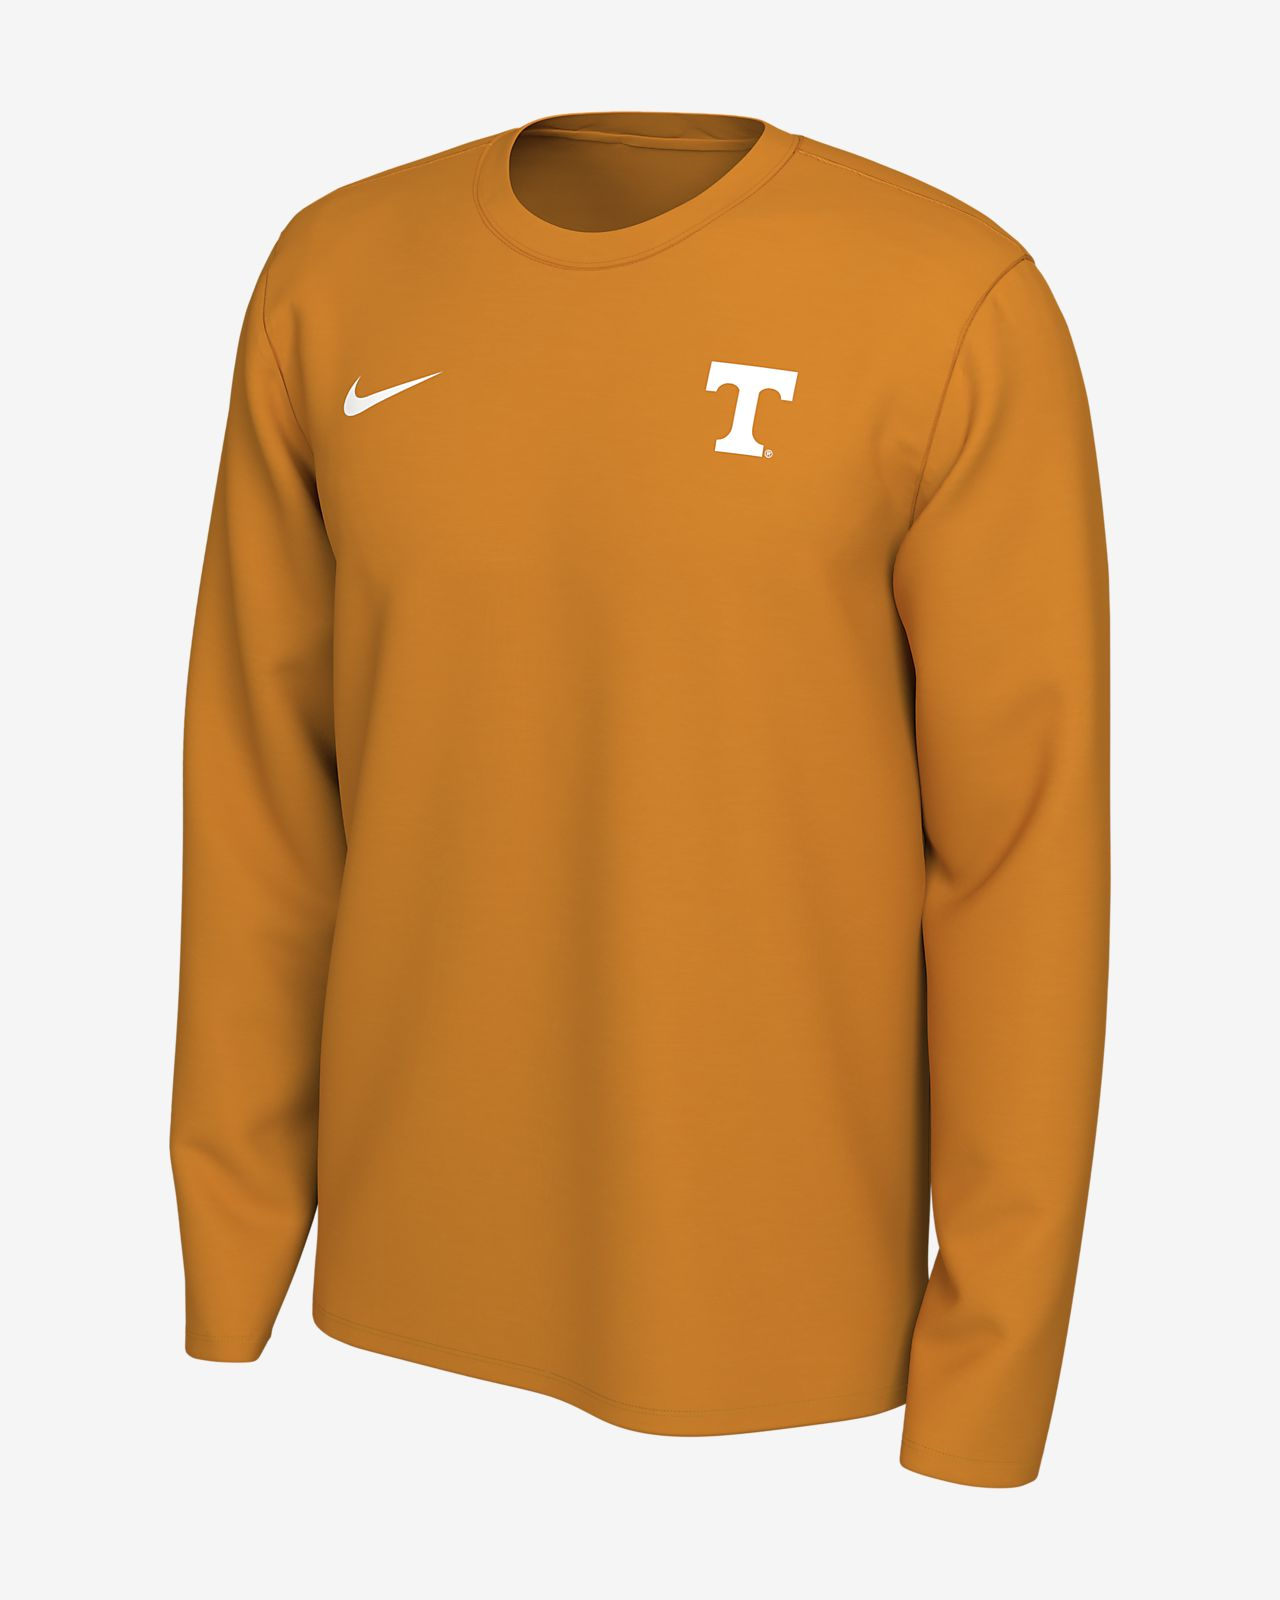 Nike Legend (Tennessee) Men's Long-Sleeve Logo T-Shirt